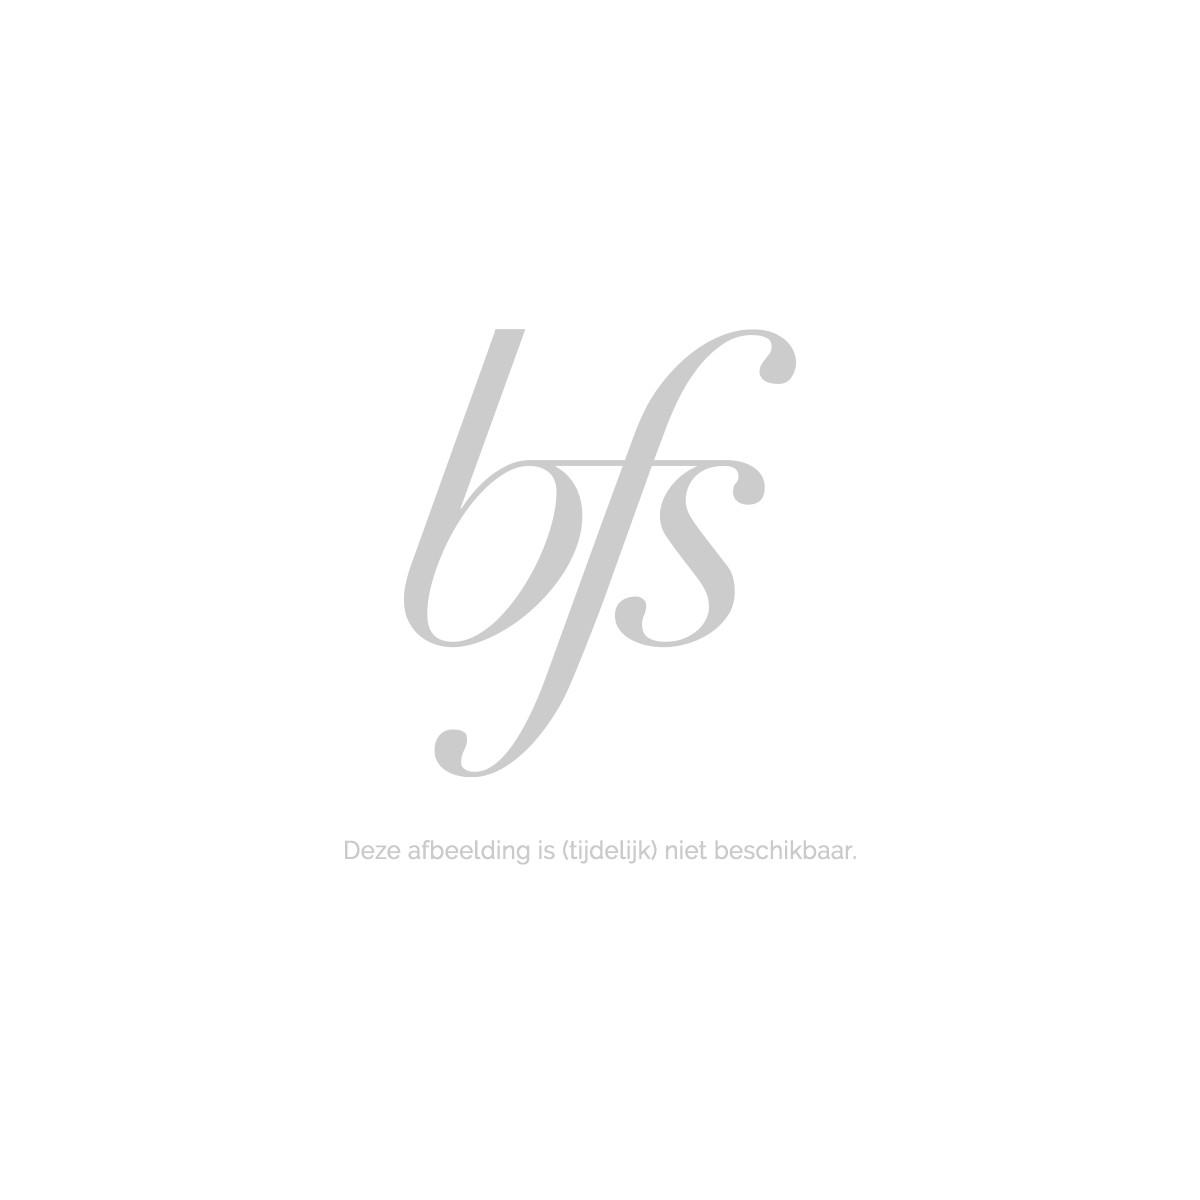 Calvin Klein Eternity Summ. For Men 2017 Eau de Toilette 100 ml